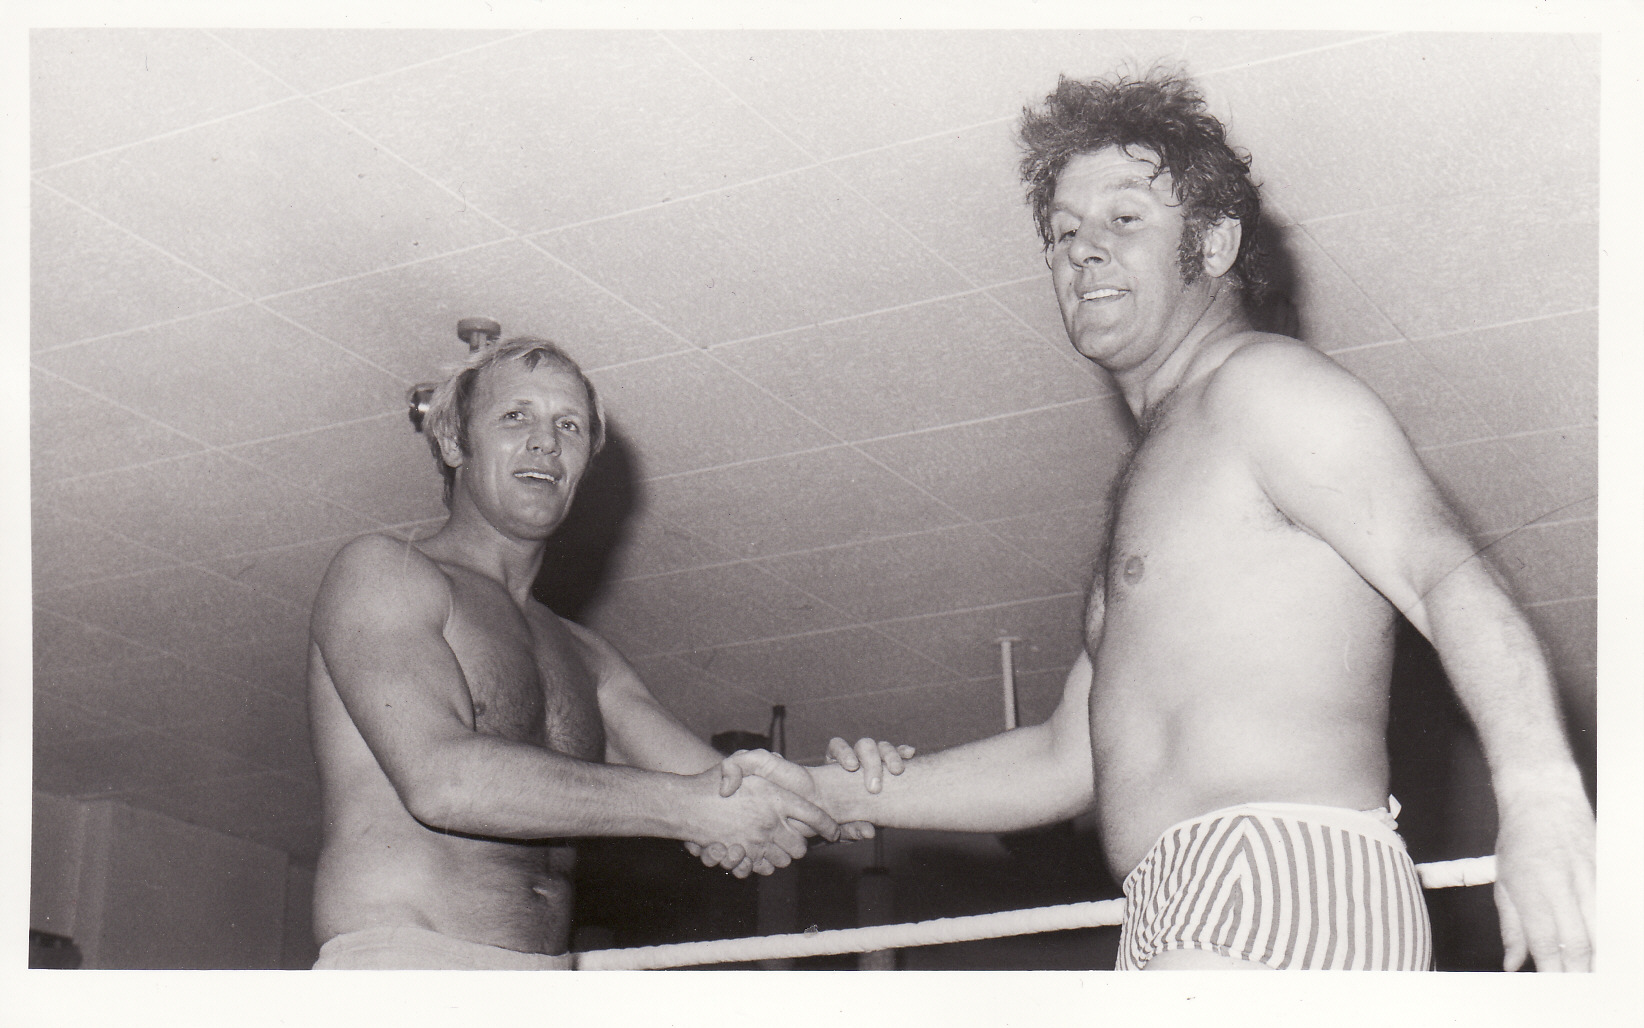 Rik Sands and Steve Veidor